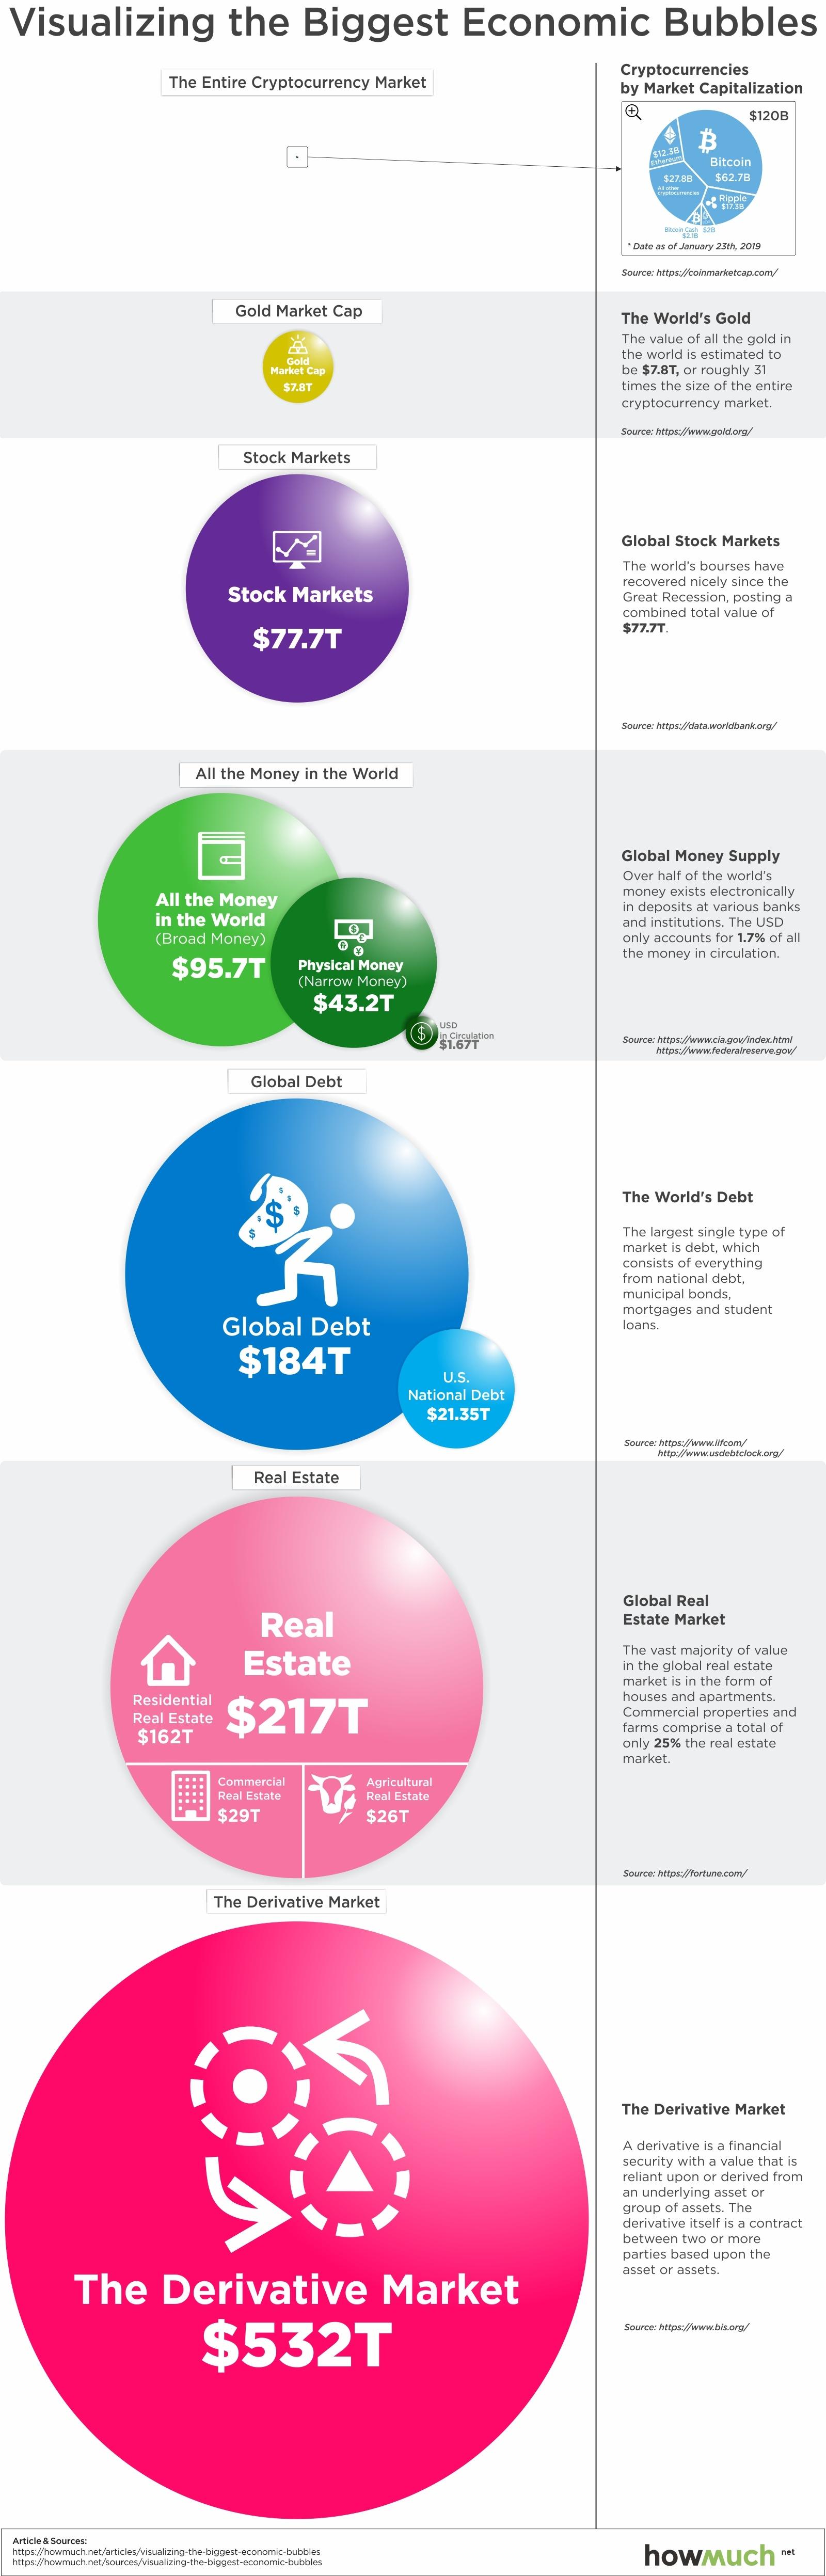 Visualizing the Biggest Economic Bubbles